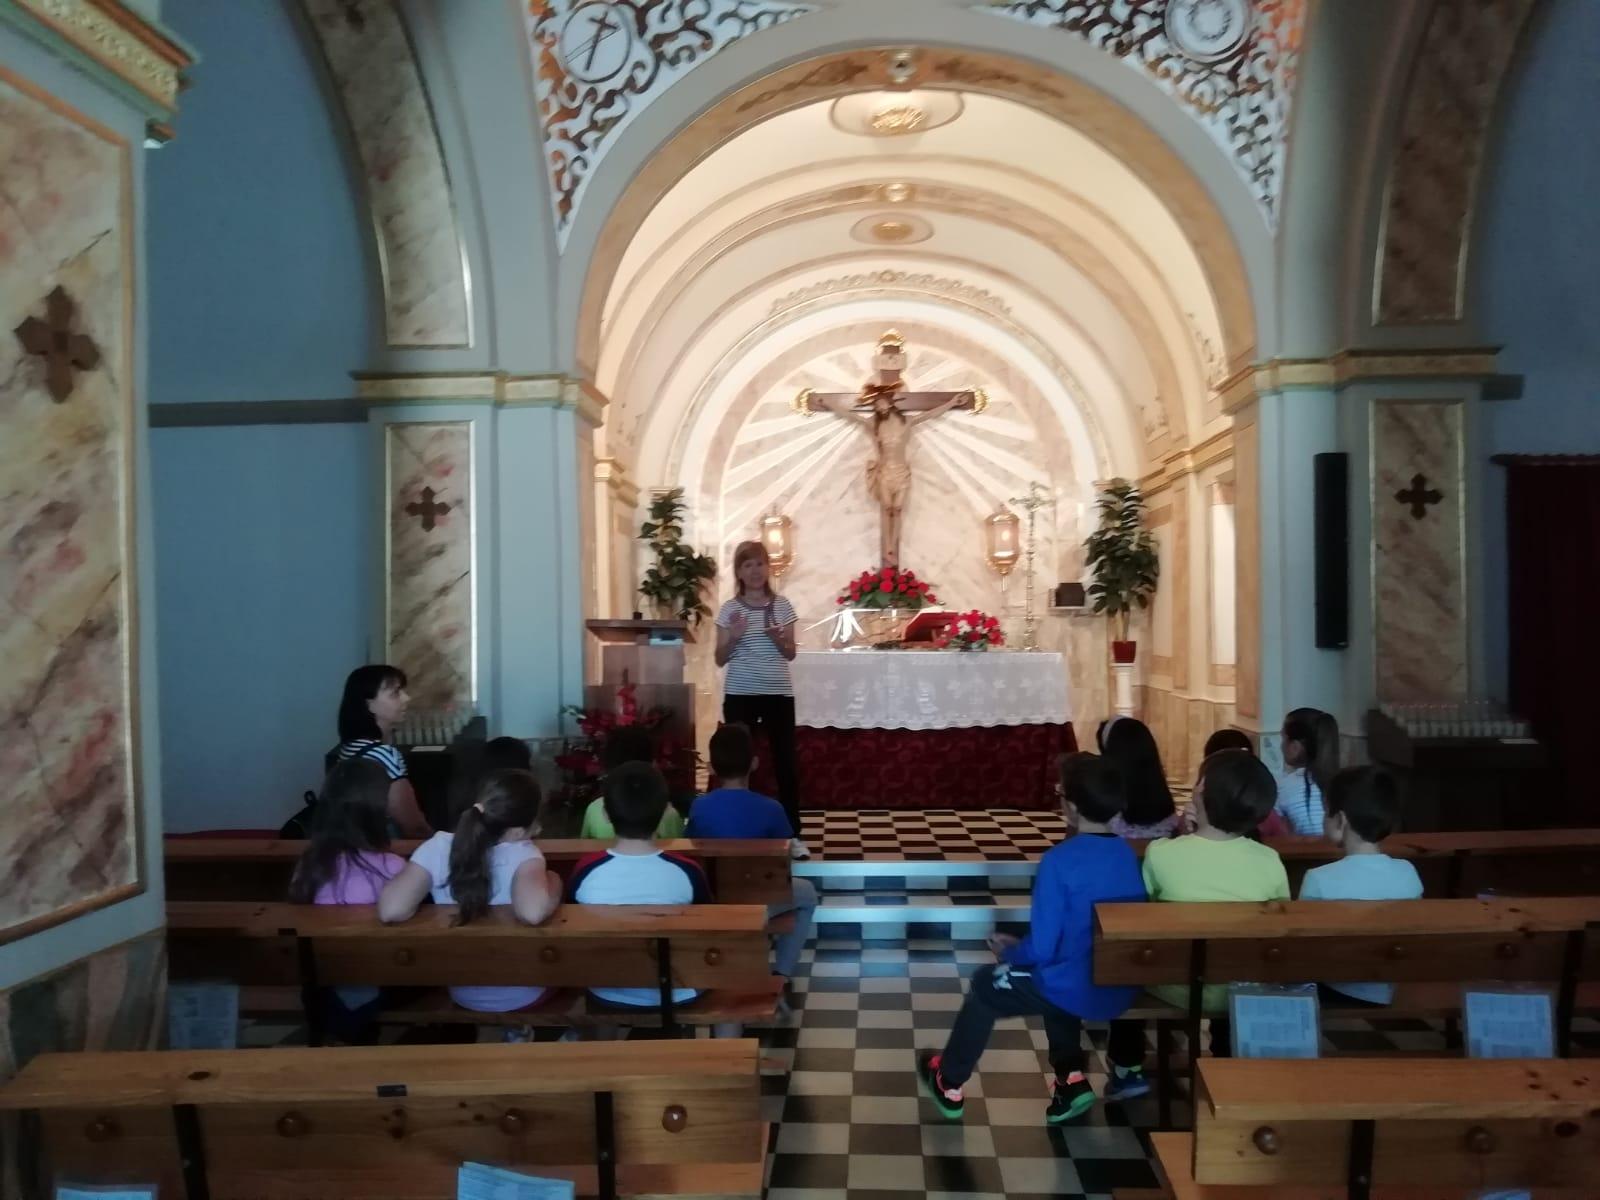 (2019-05-23) Visita ermita alumnos Laura - 3 C primaria - Reina Sofia - María Isabel Berenguer (10)